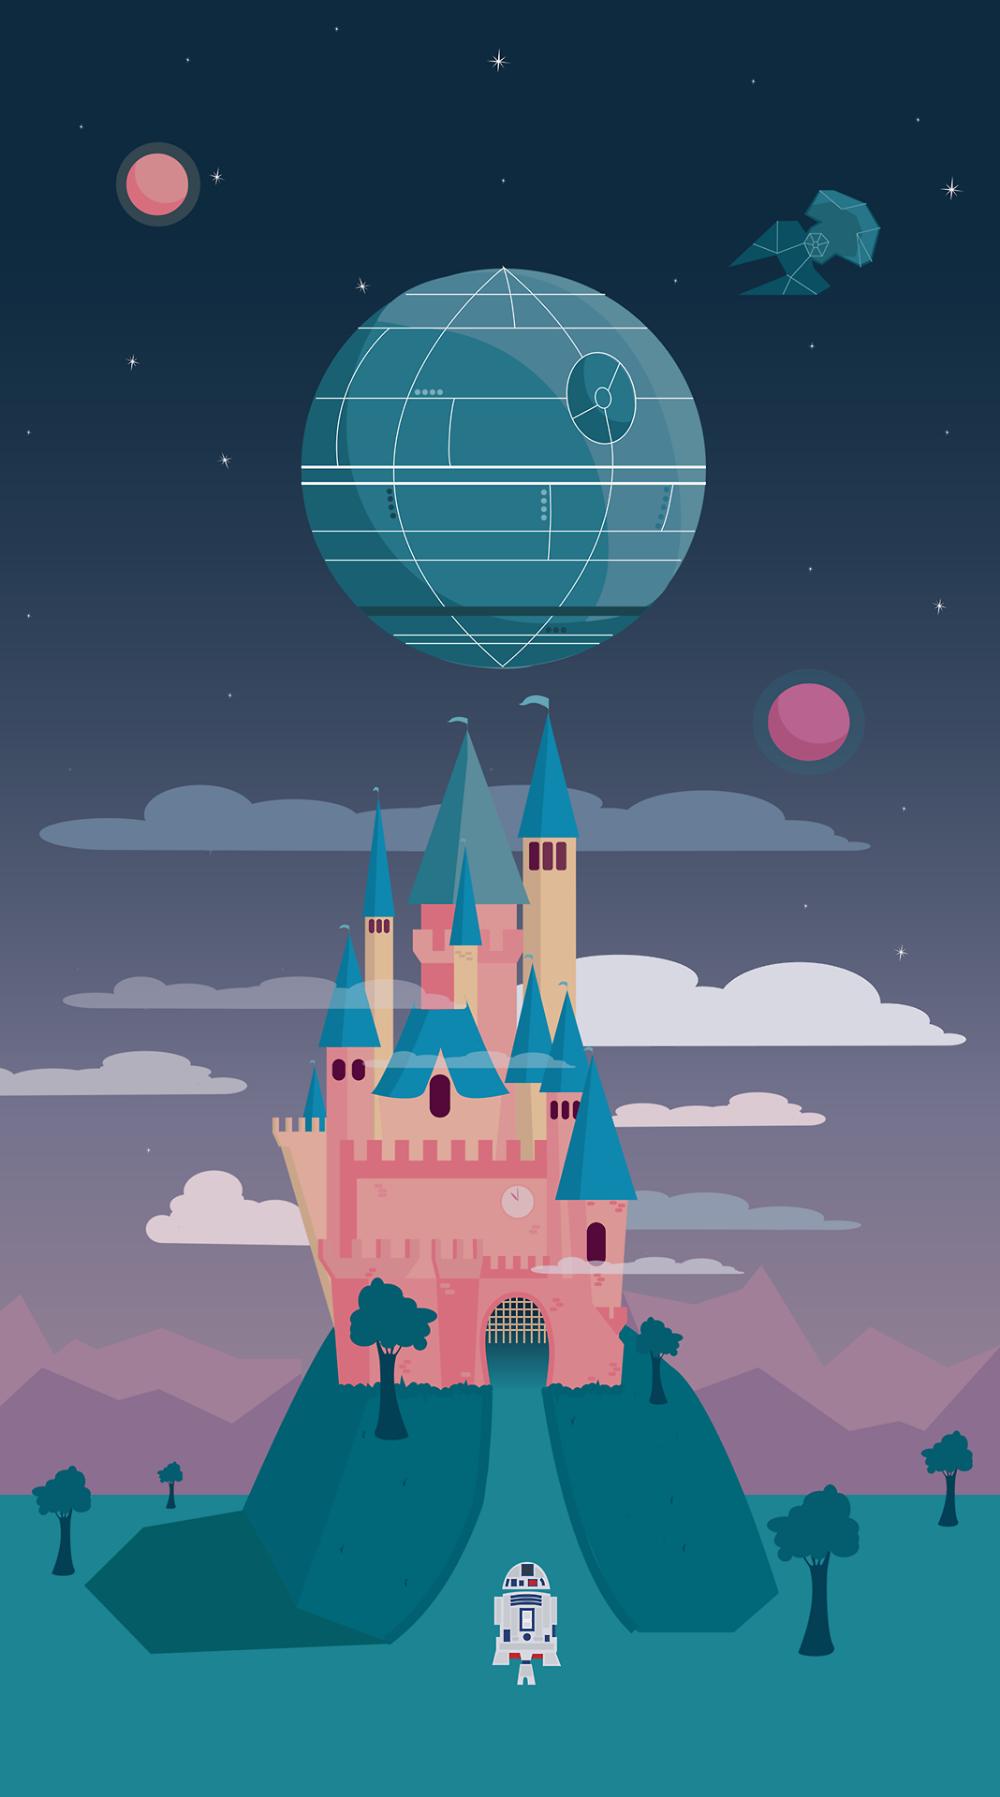 Tiefighters Disney Star Wars Castle Created By Lara Pater In 2020 Star Wars Wallpaper Disney Star Wars Star Wars Wallpaper Iphone